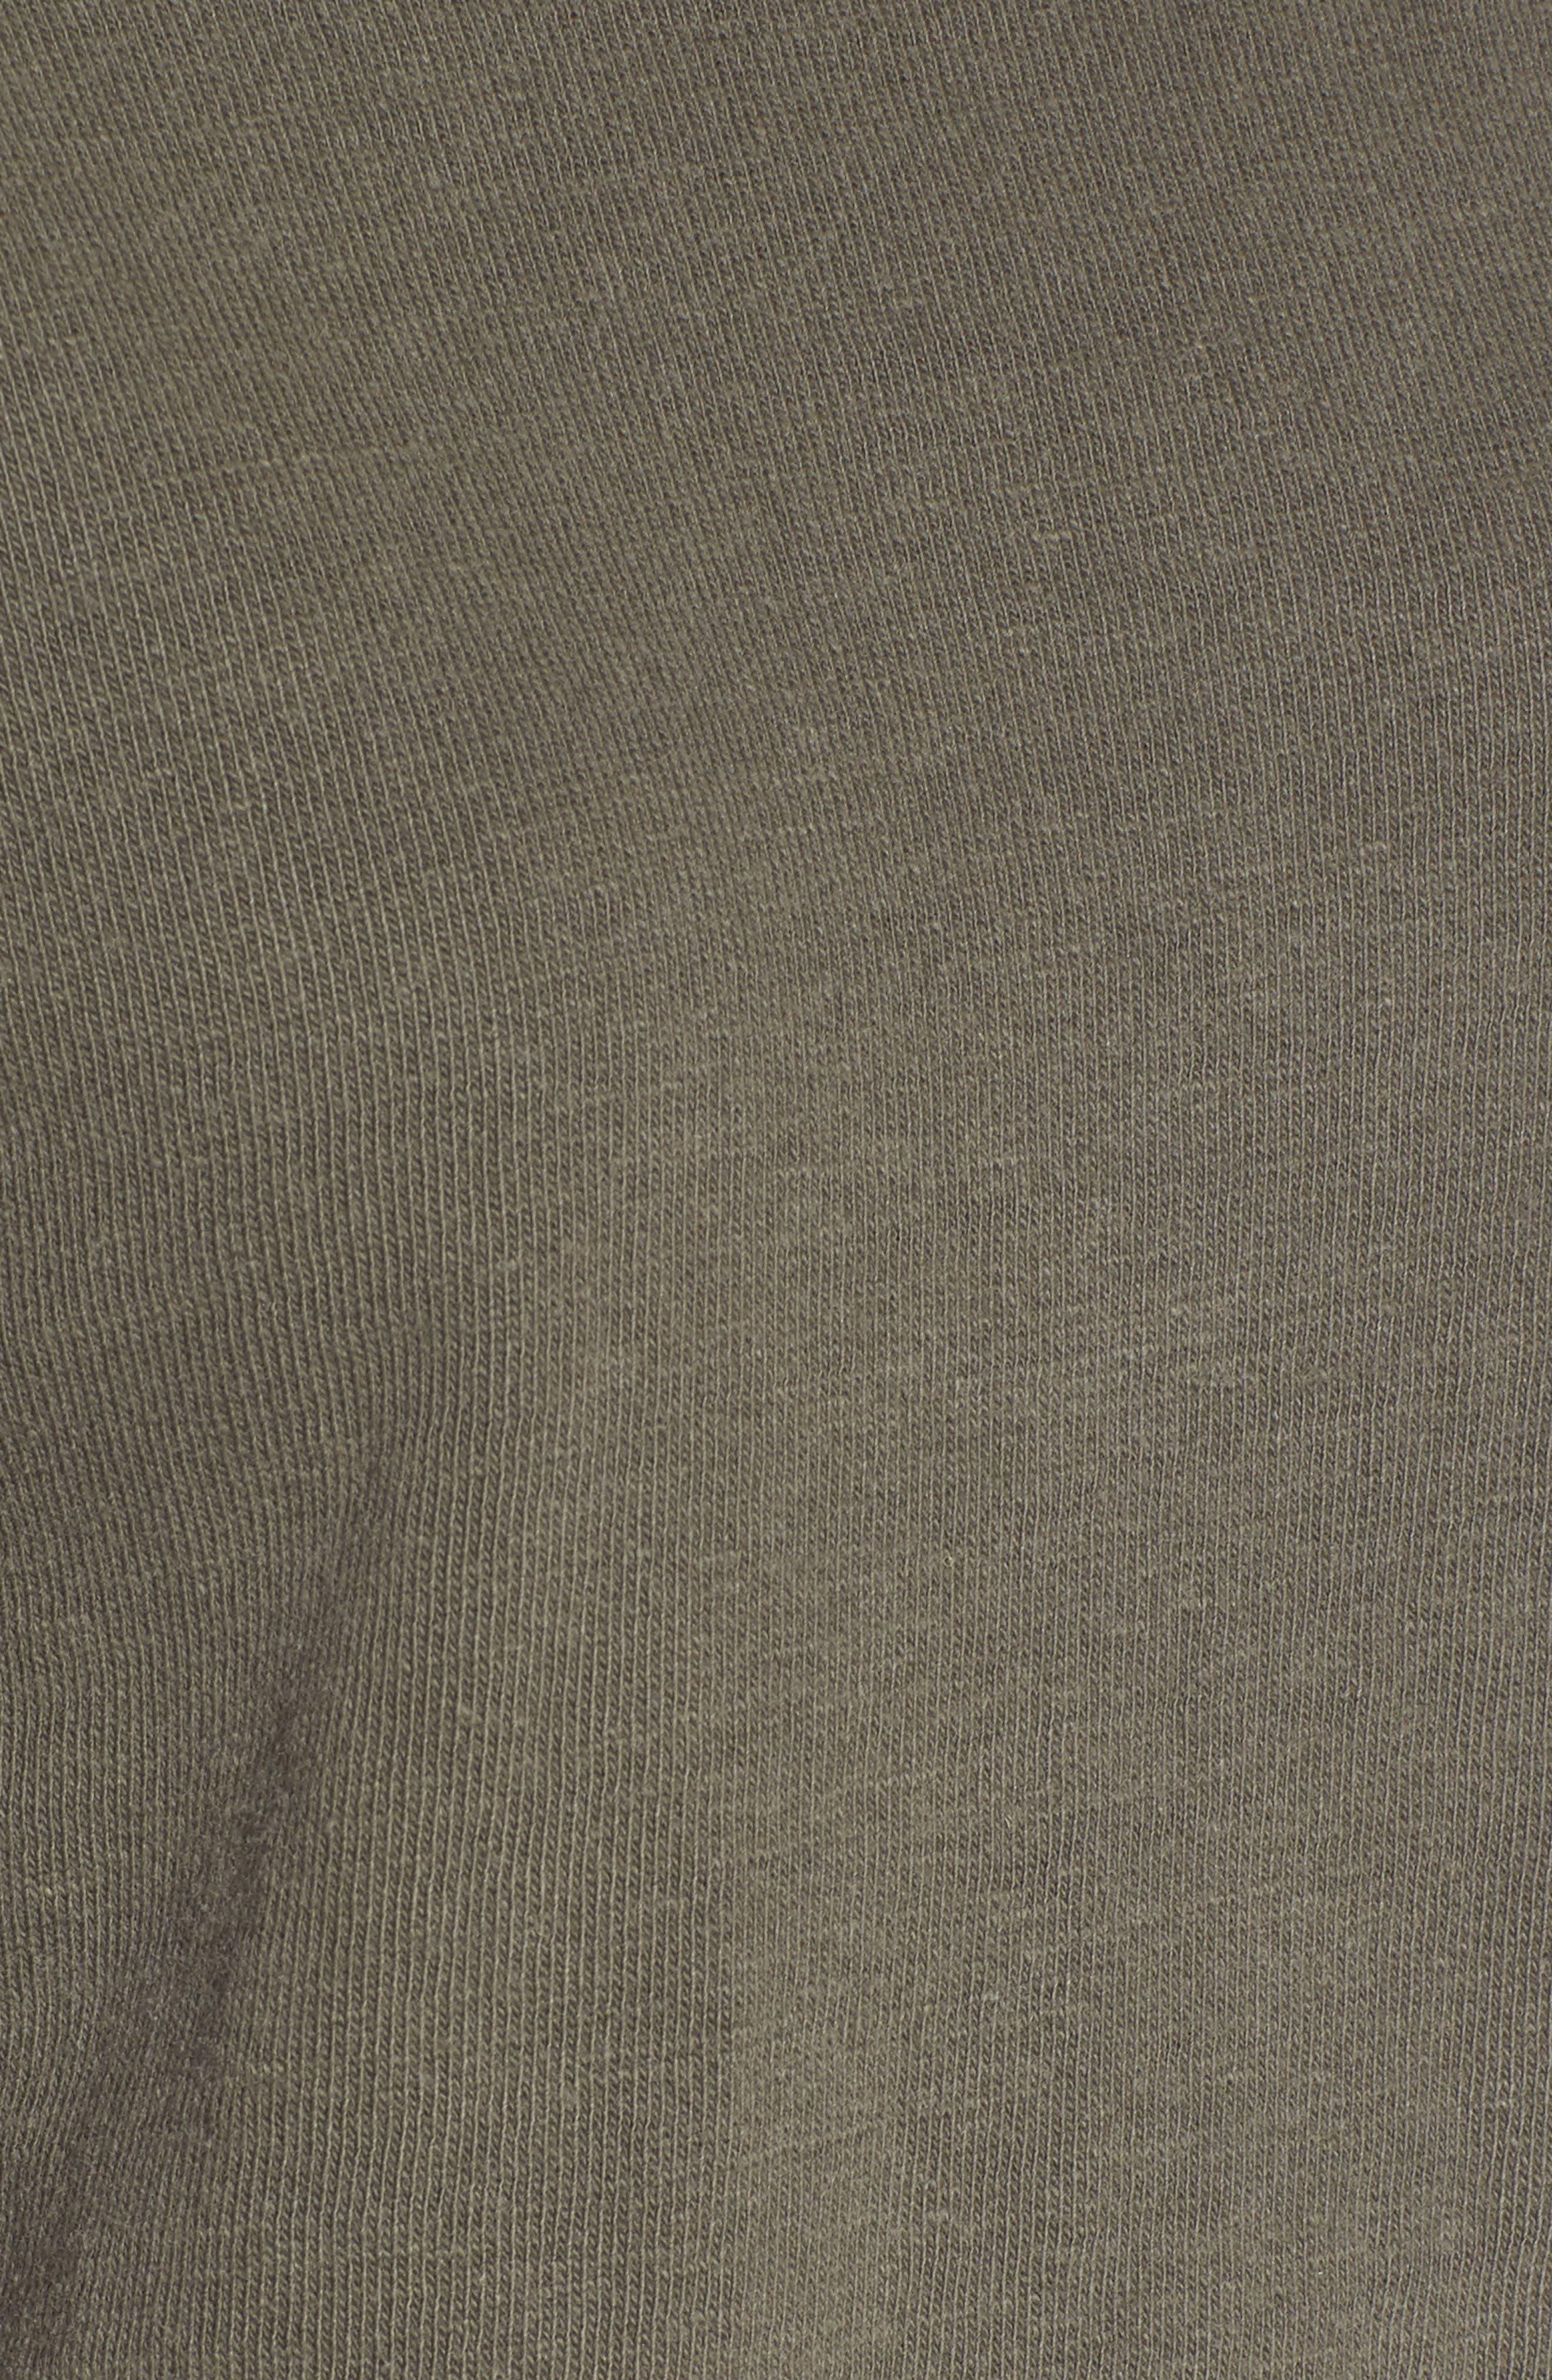 Alternate Image 5  - James Perse Distressed Sweatshirt